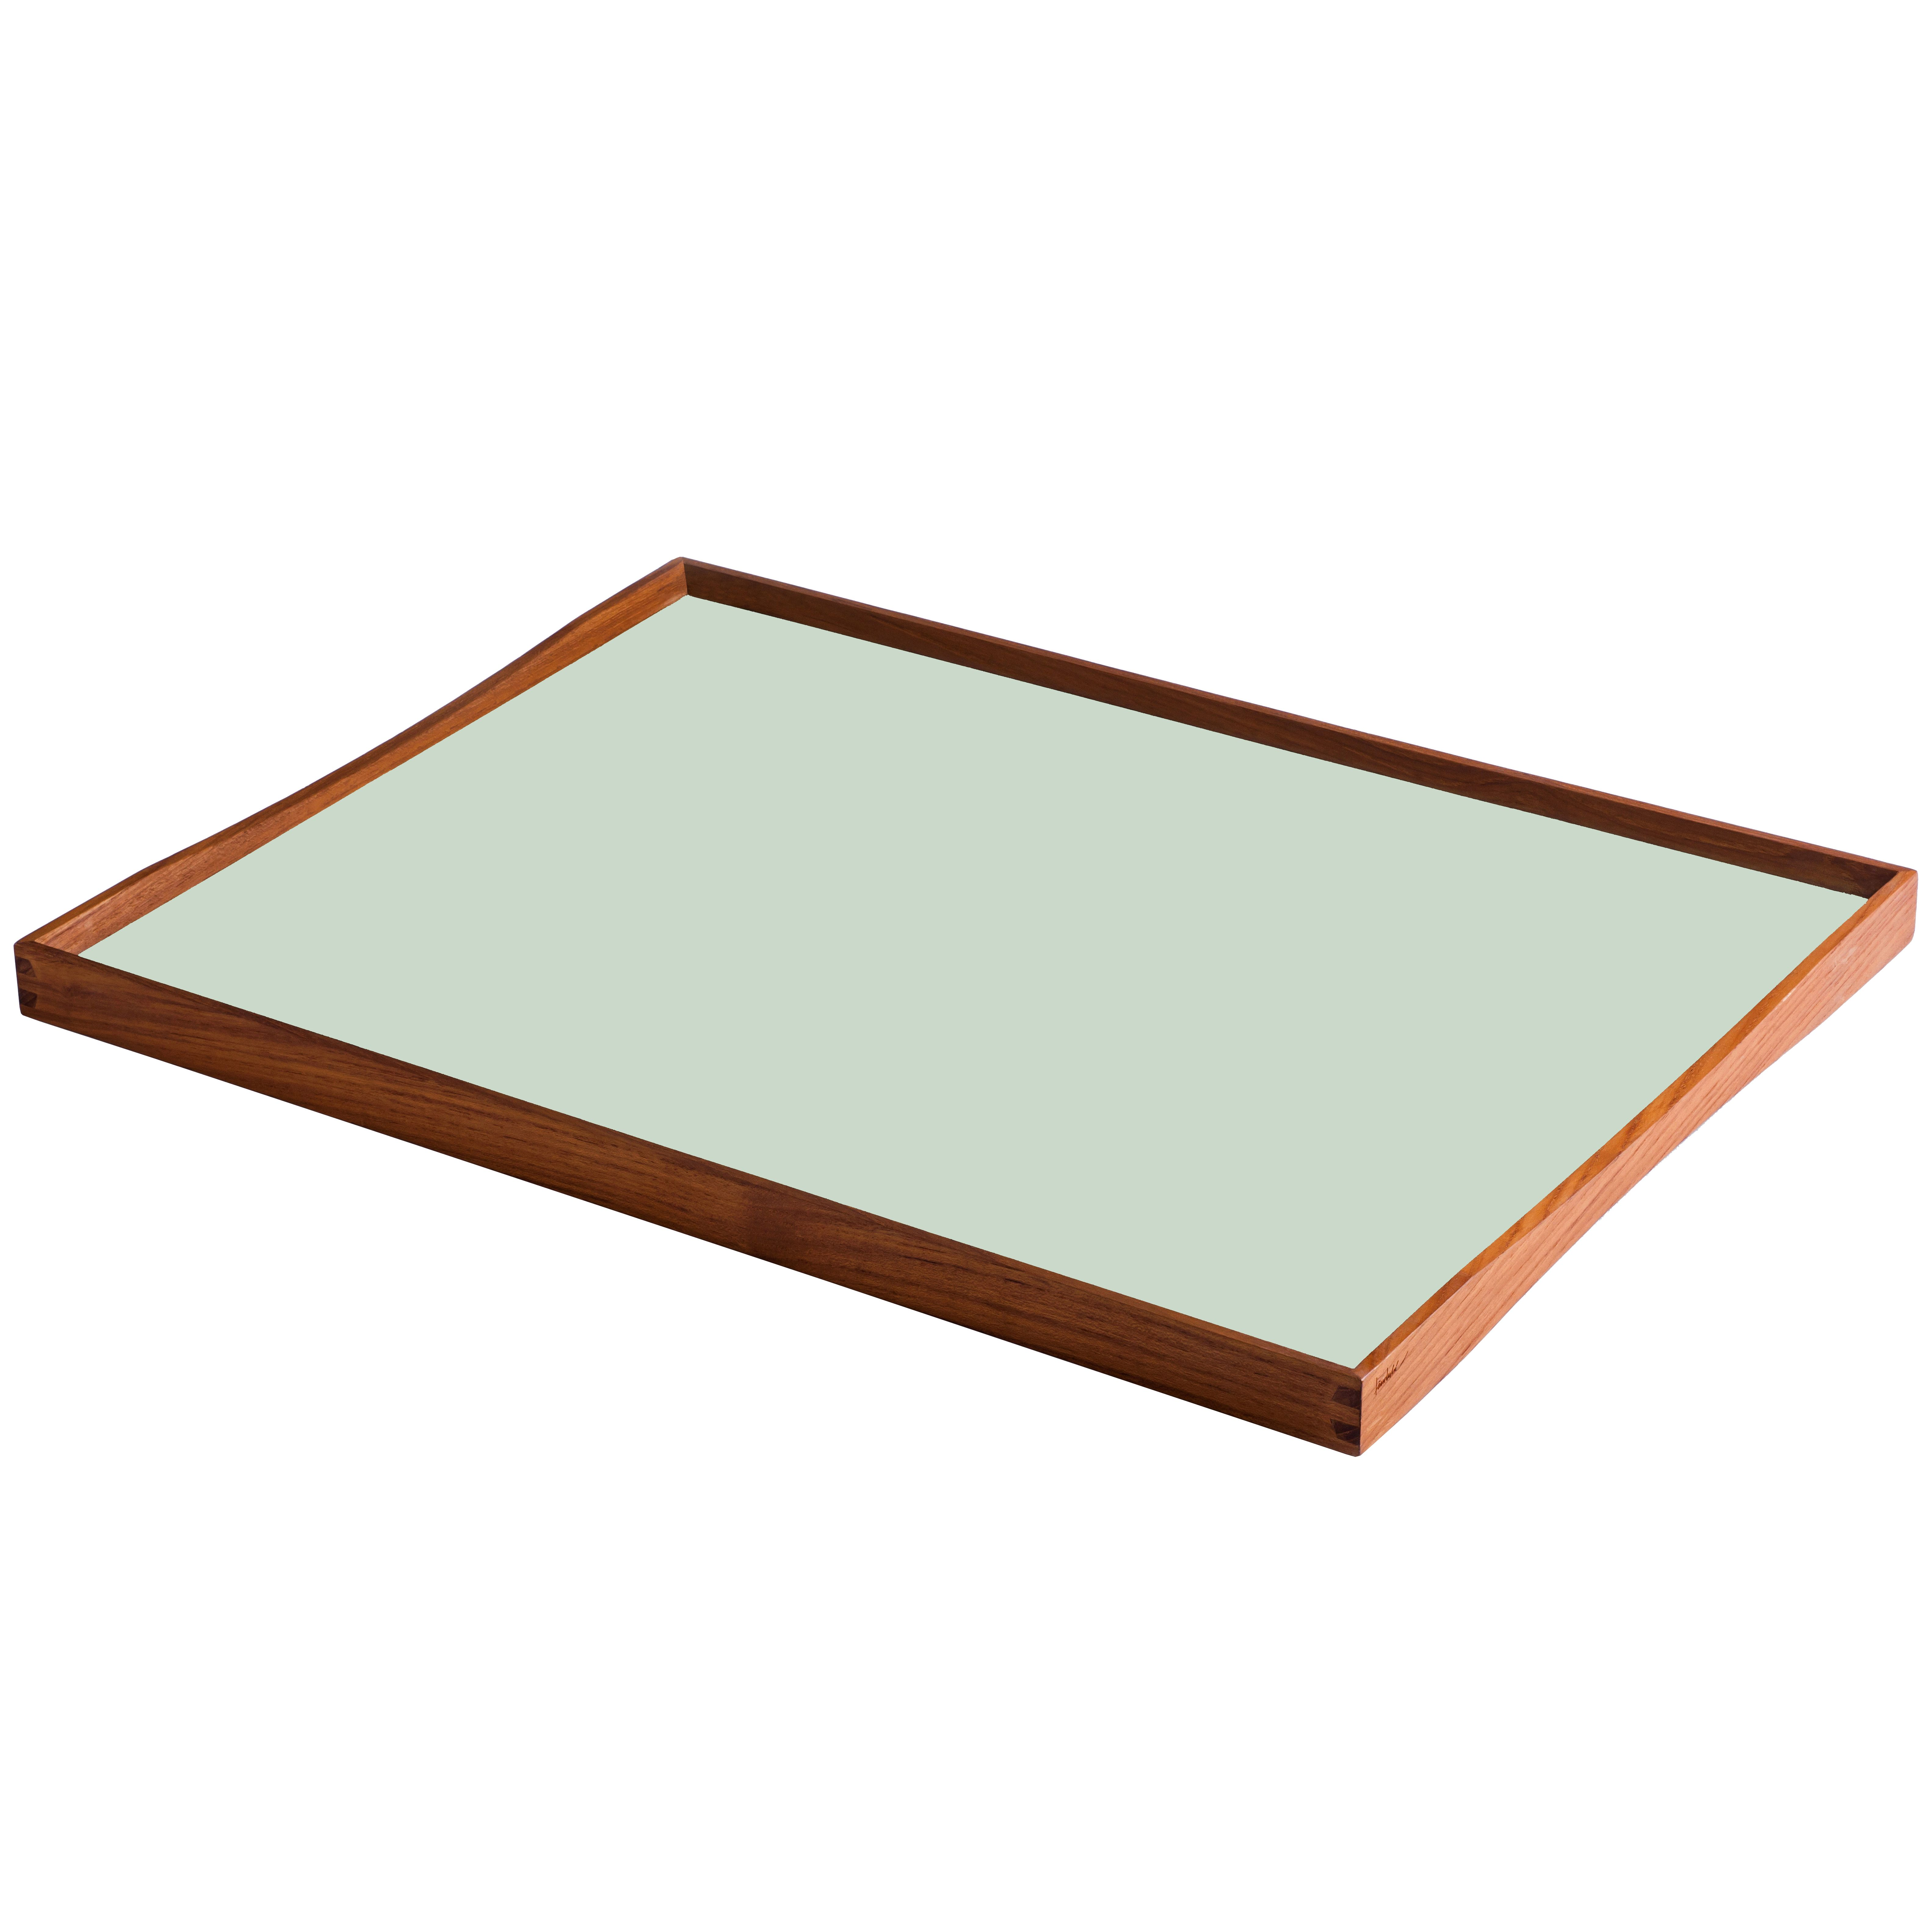 ArchitectMade Turning Tray 3 dienblad Husky green kopen